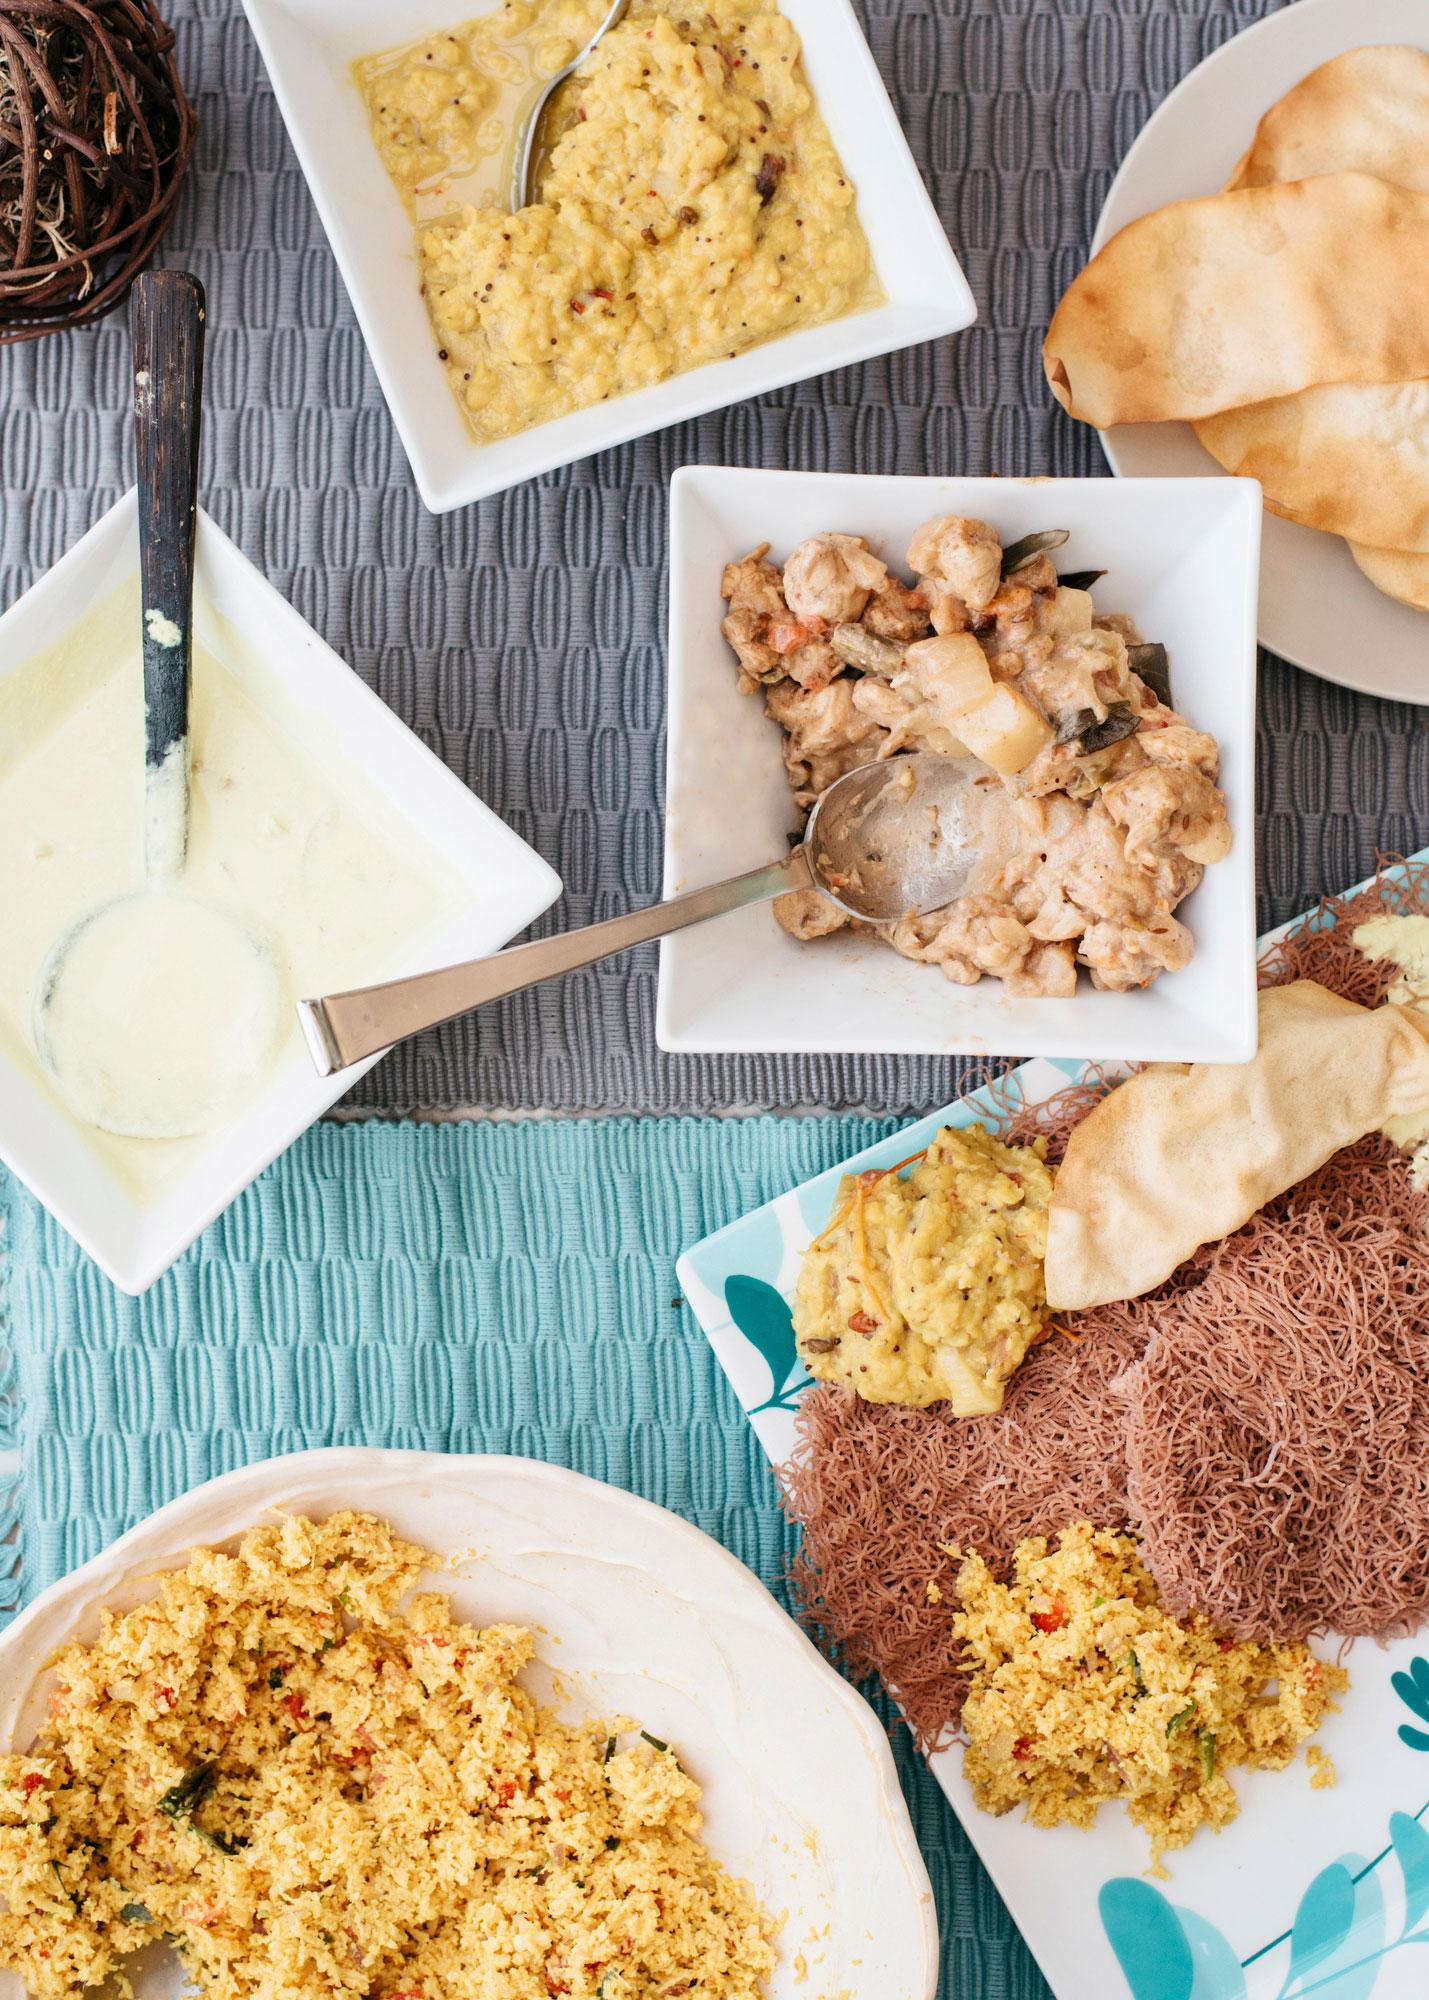 Los_Angeles_Food_photographer_Rebecca_Peloquin_Sri_Lankan_Food_026.JPG